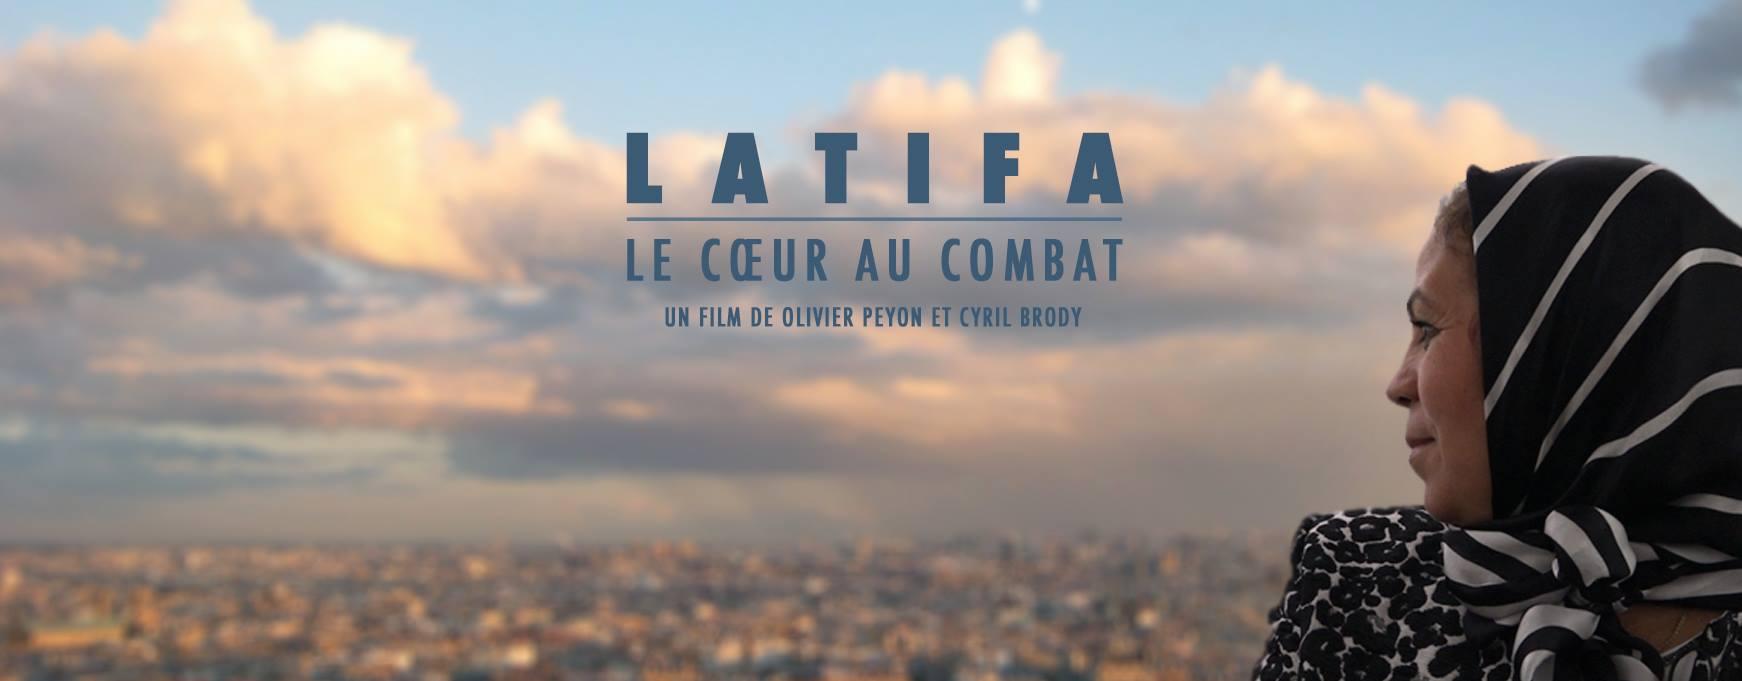 Latifa couv